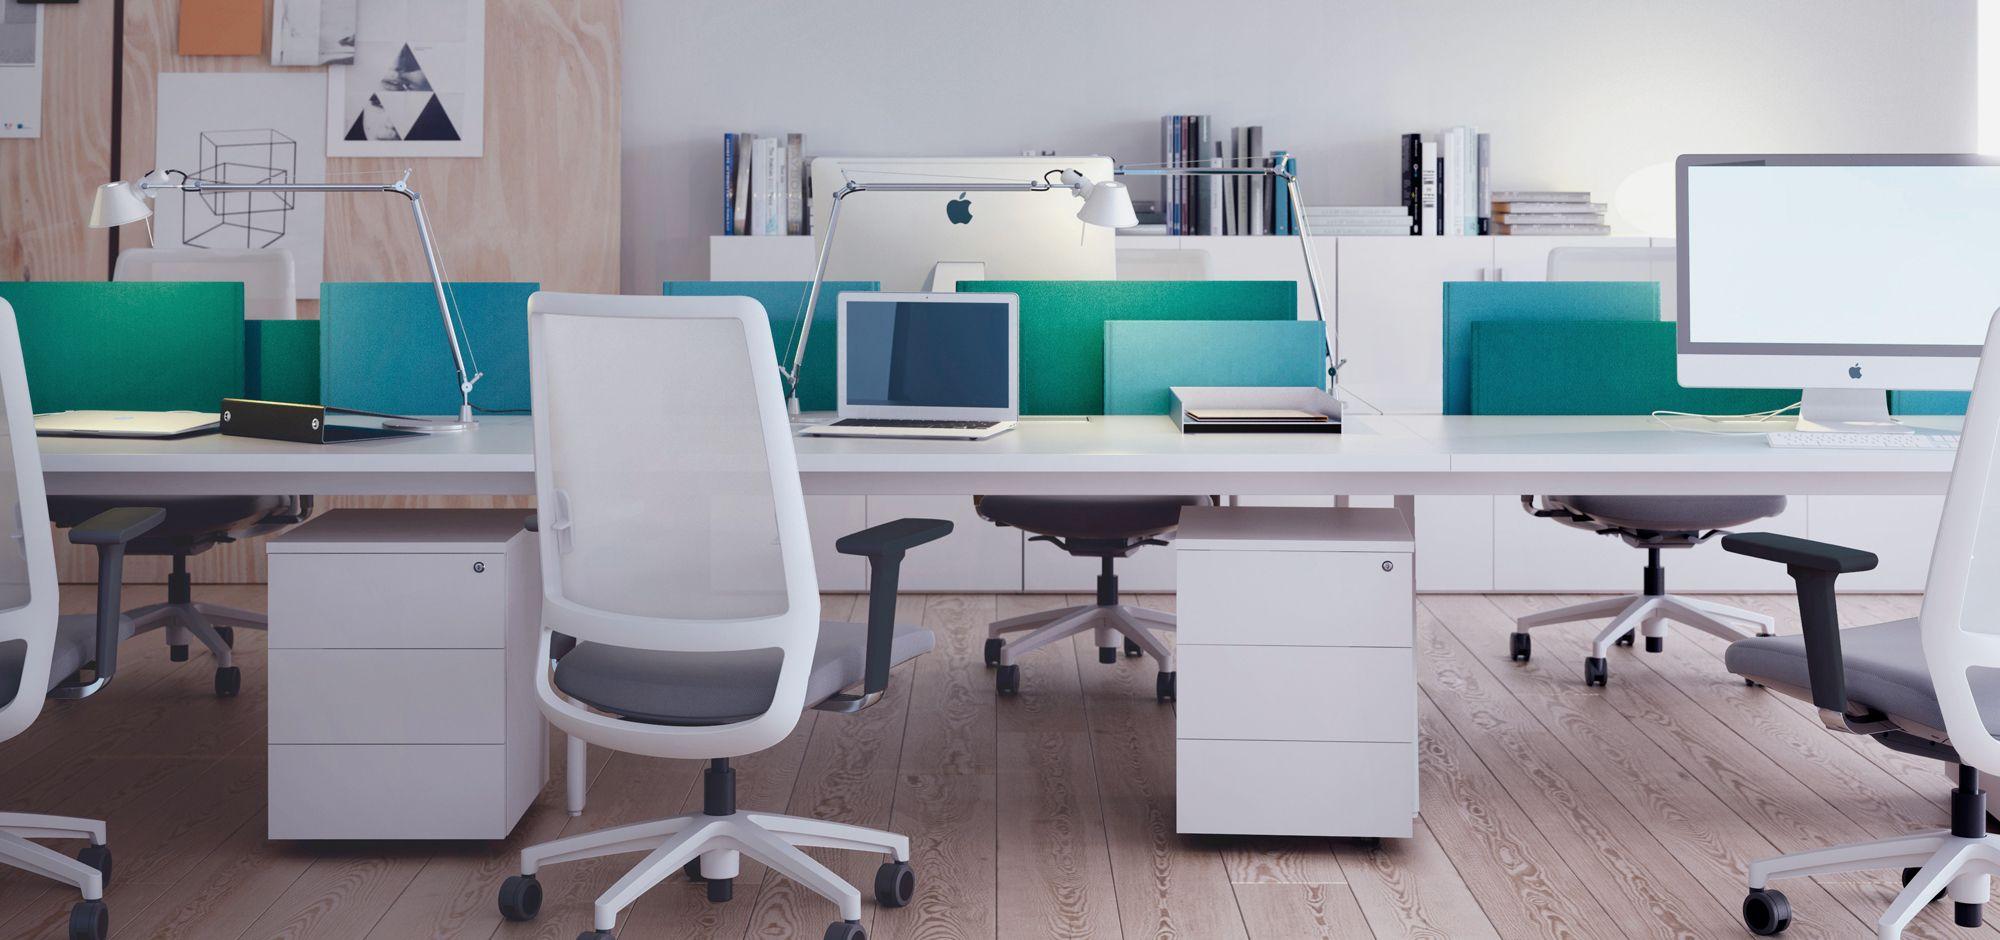 Mobiliario oficina sant cugat del vall s for Mobiliario de oficina precios